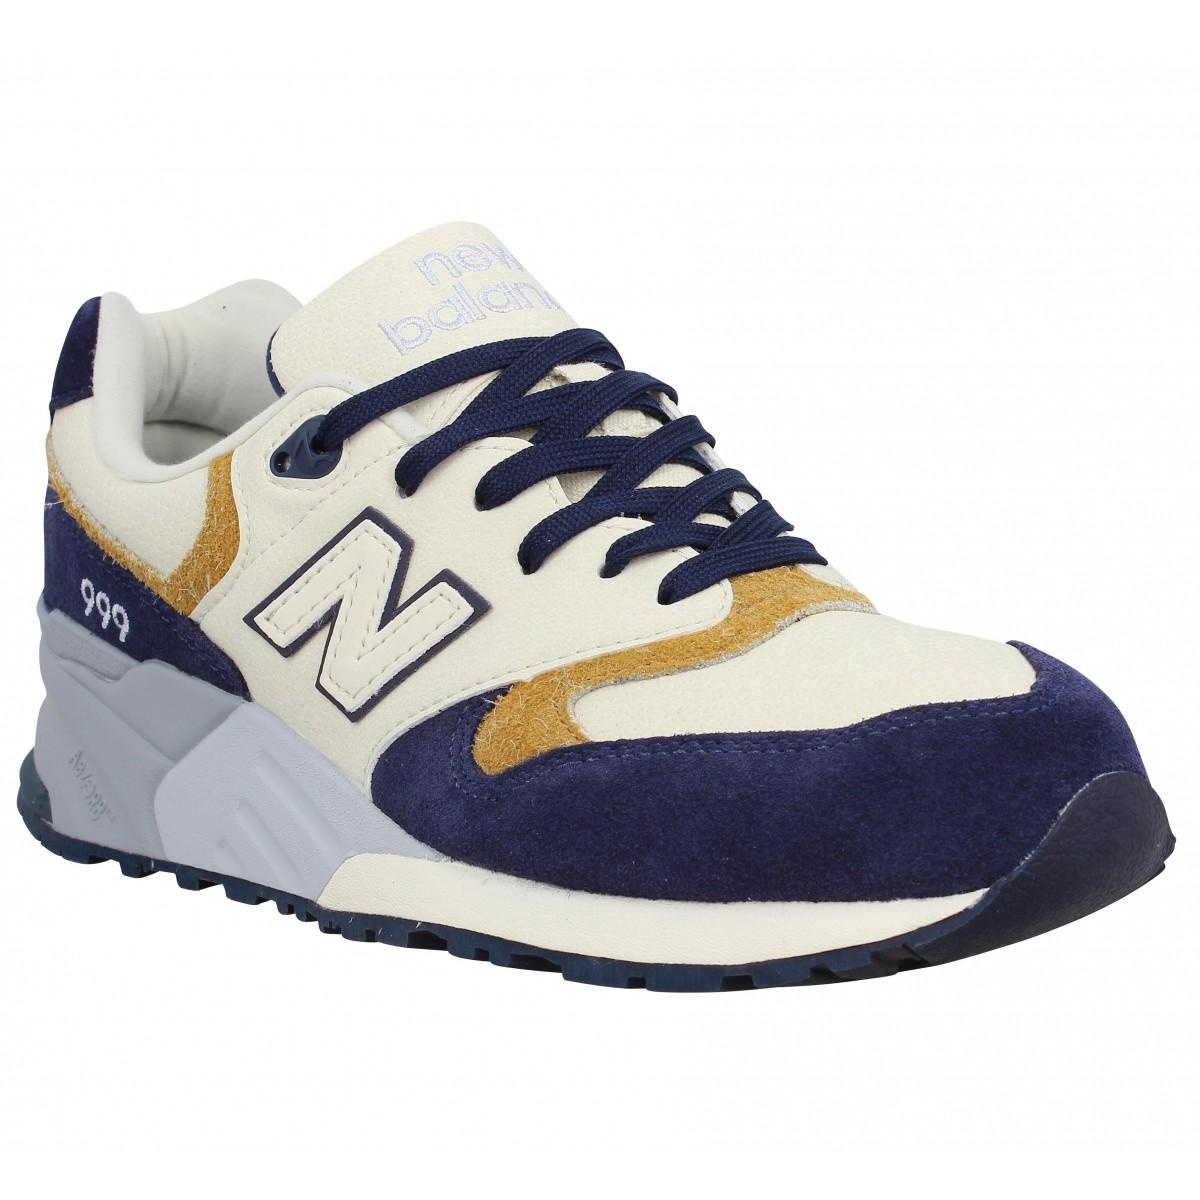 New Balance ML999 NA beige et bleu marine Chaussures